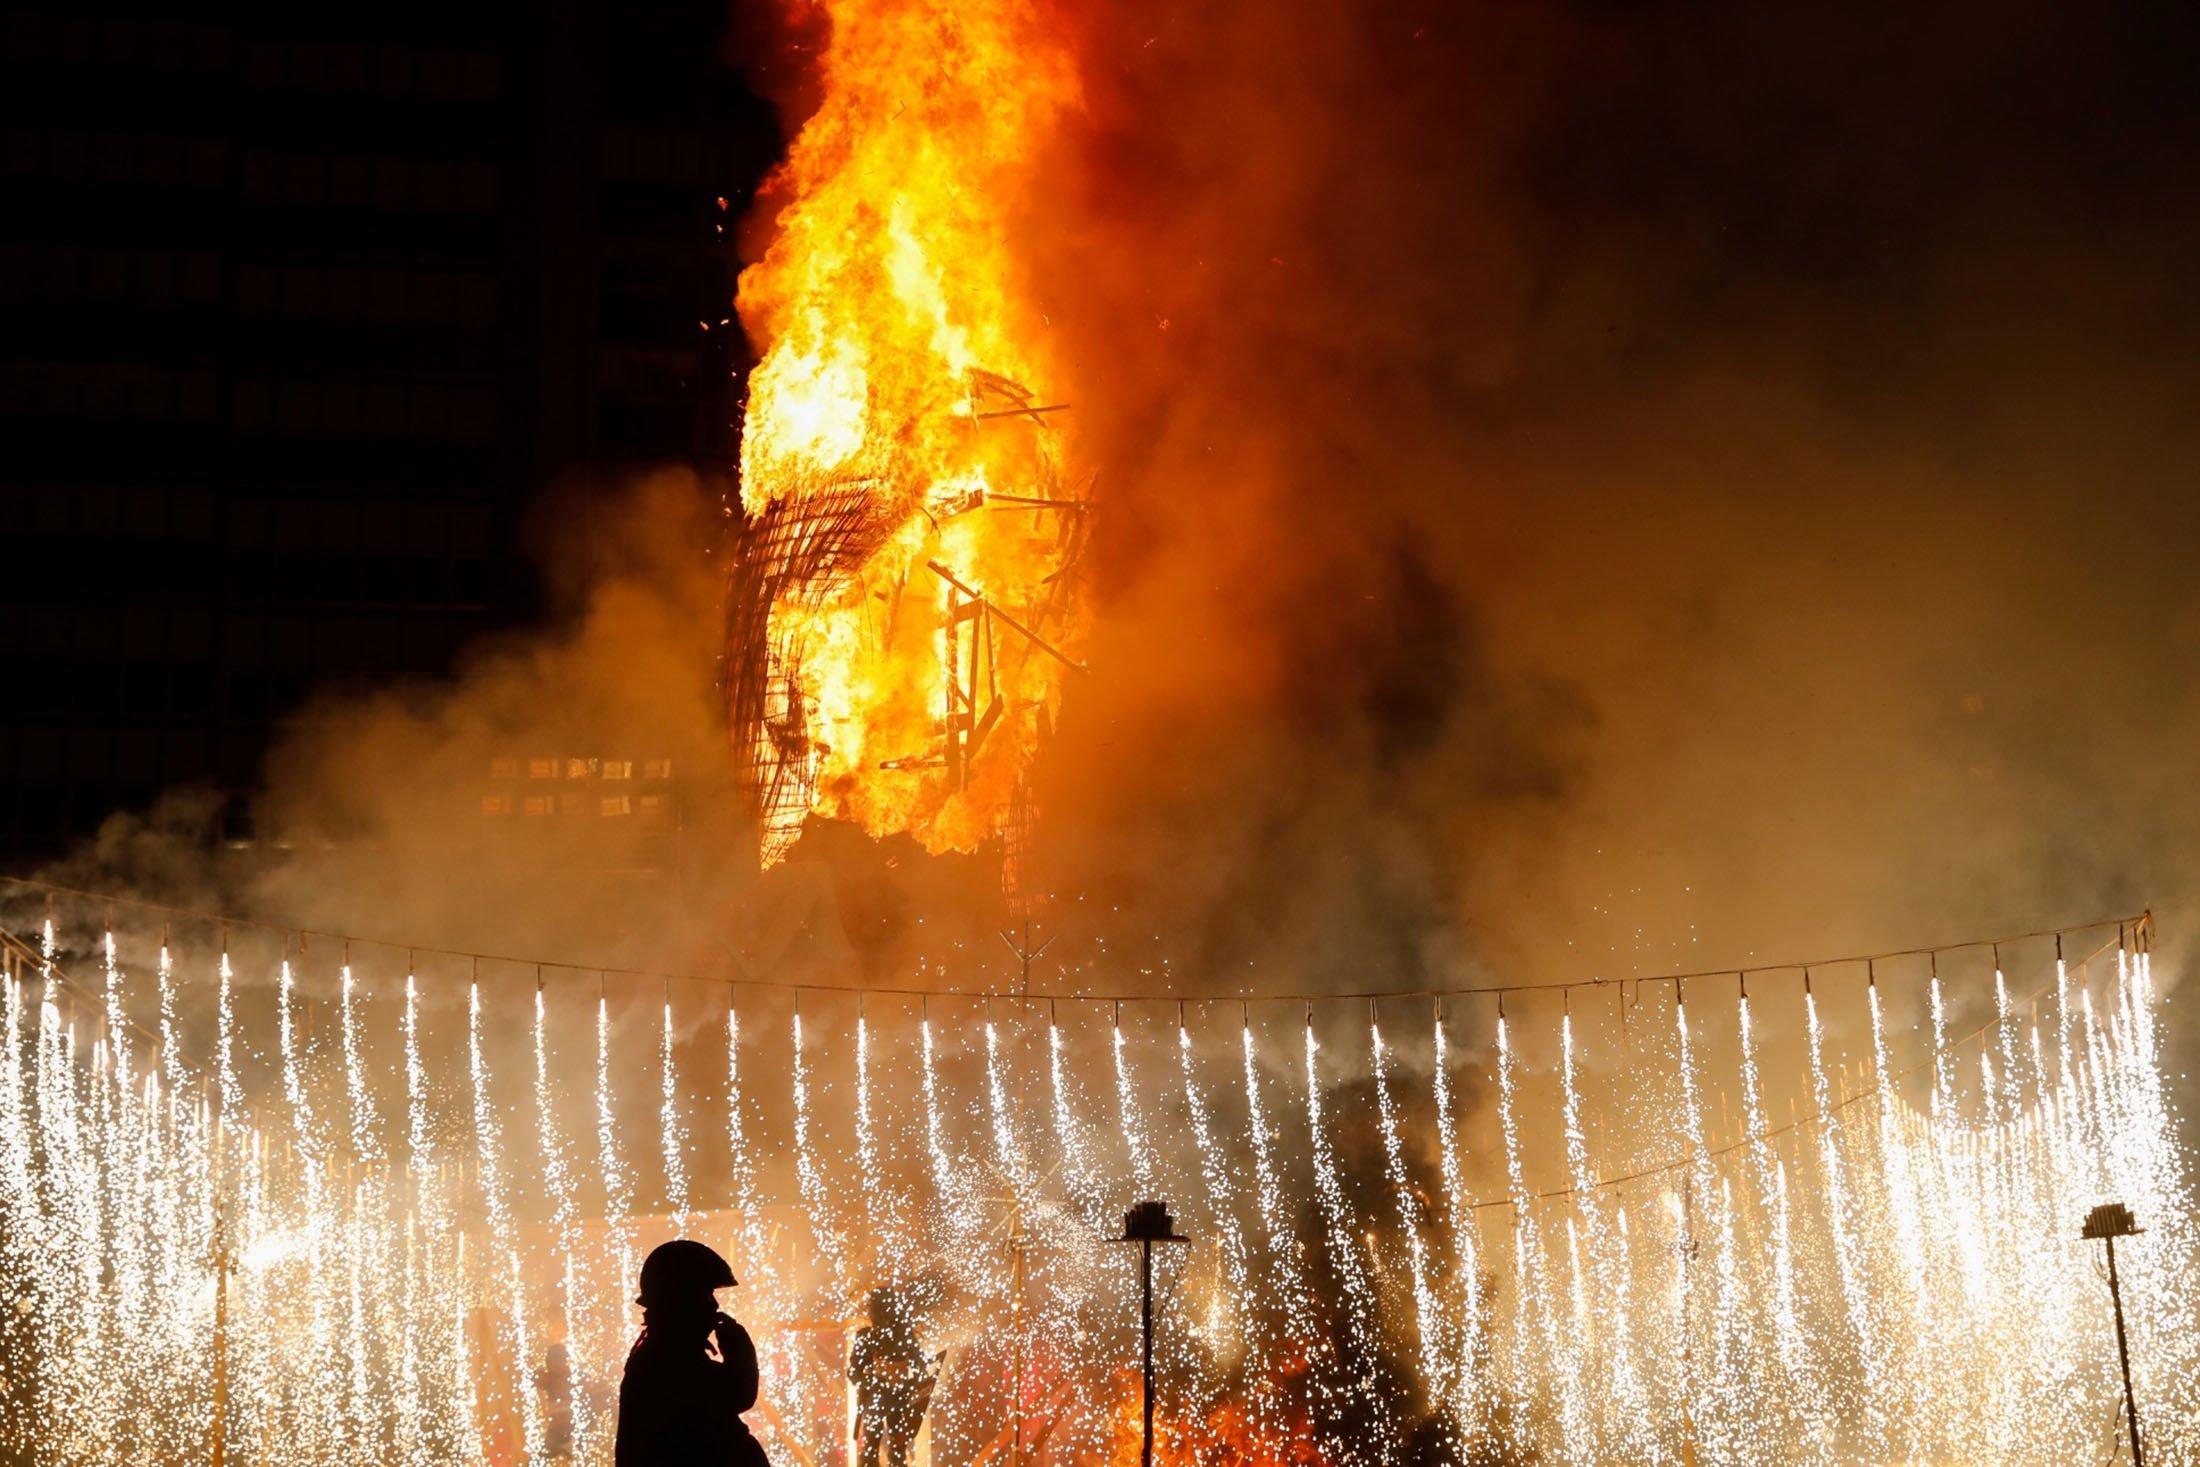 A figure of the municipal Falla, 'La meditadora,' burns during the end of the Fallas festival, in Valencia, Spain, Sept. 5, 2021. (Reuters Photo)